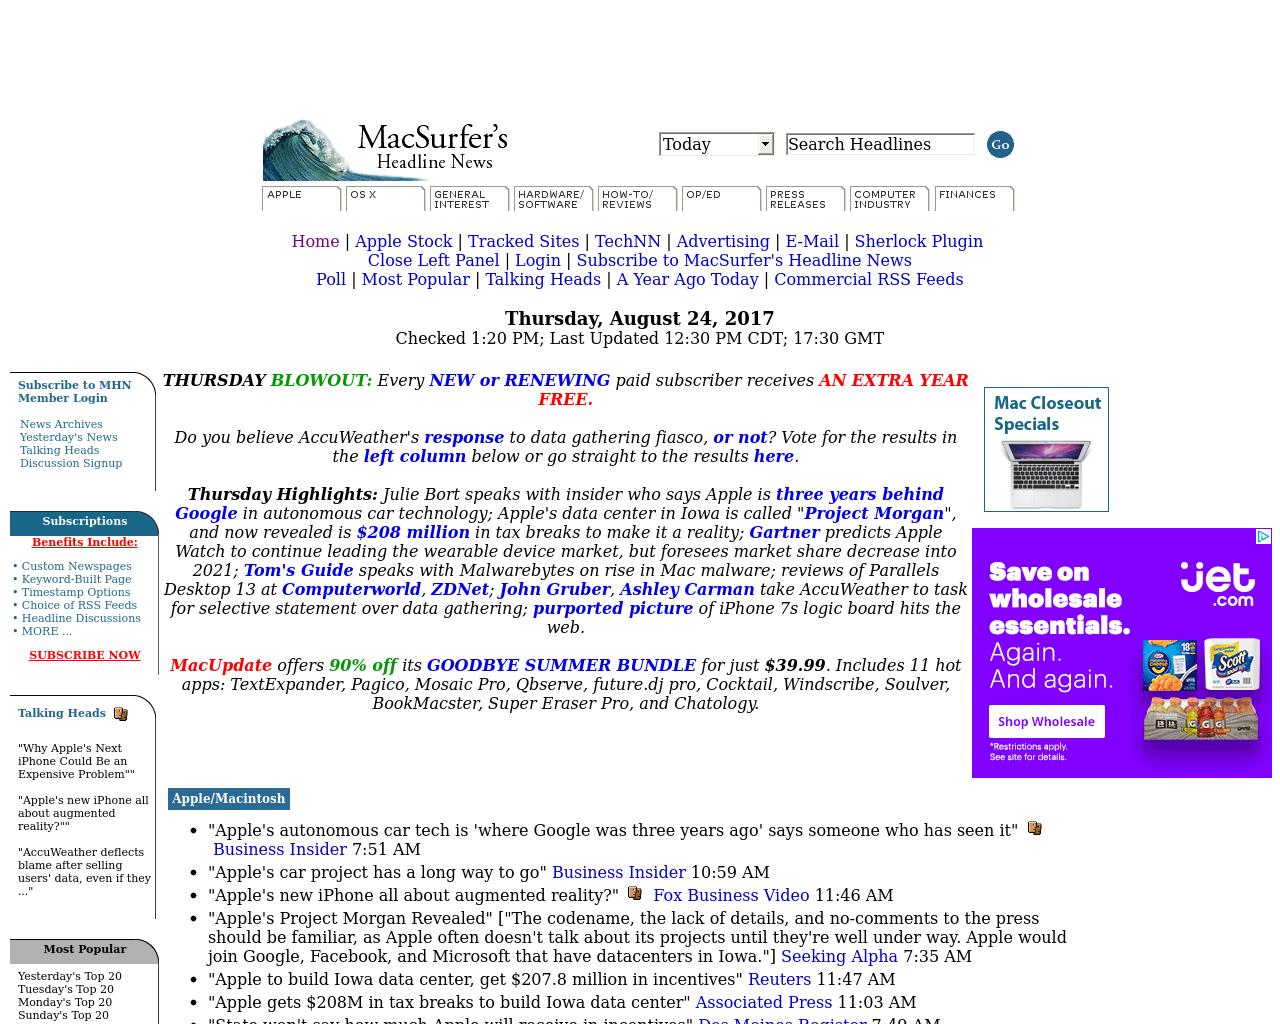 MacSurfer's-Headline-News-Advertising-Reviews-Pricing